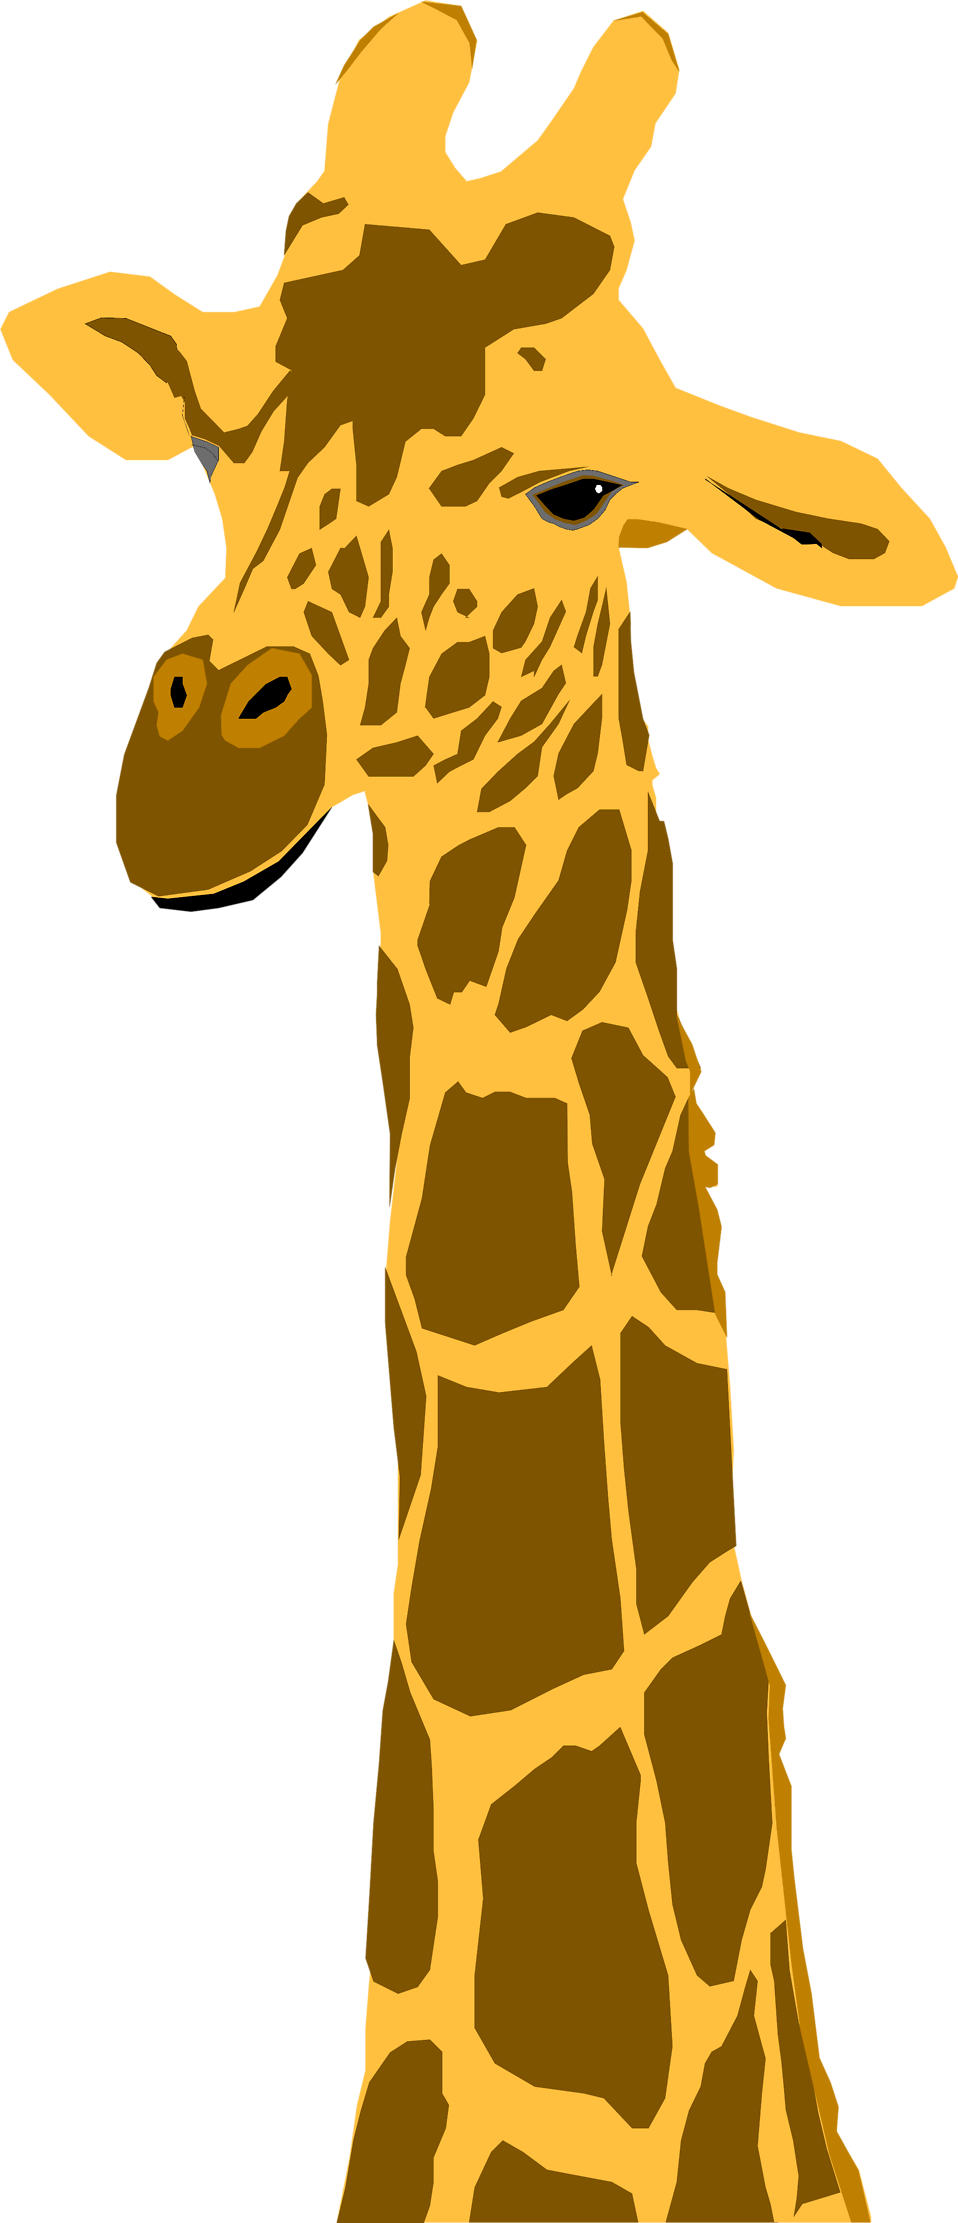 Neck clipart giraffe. Free stock photo illustration